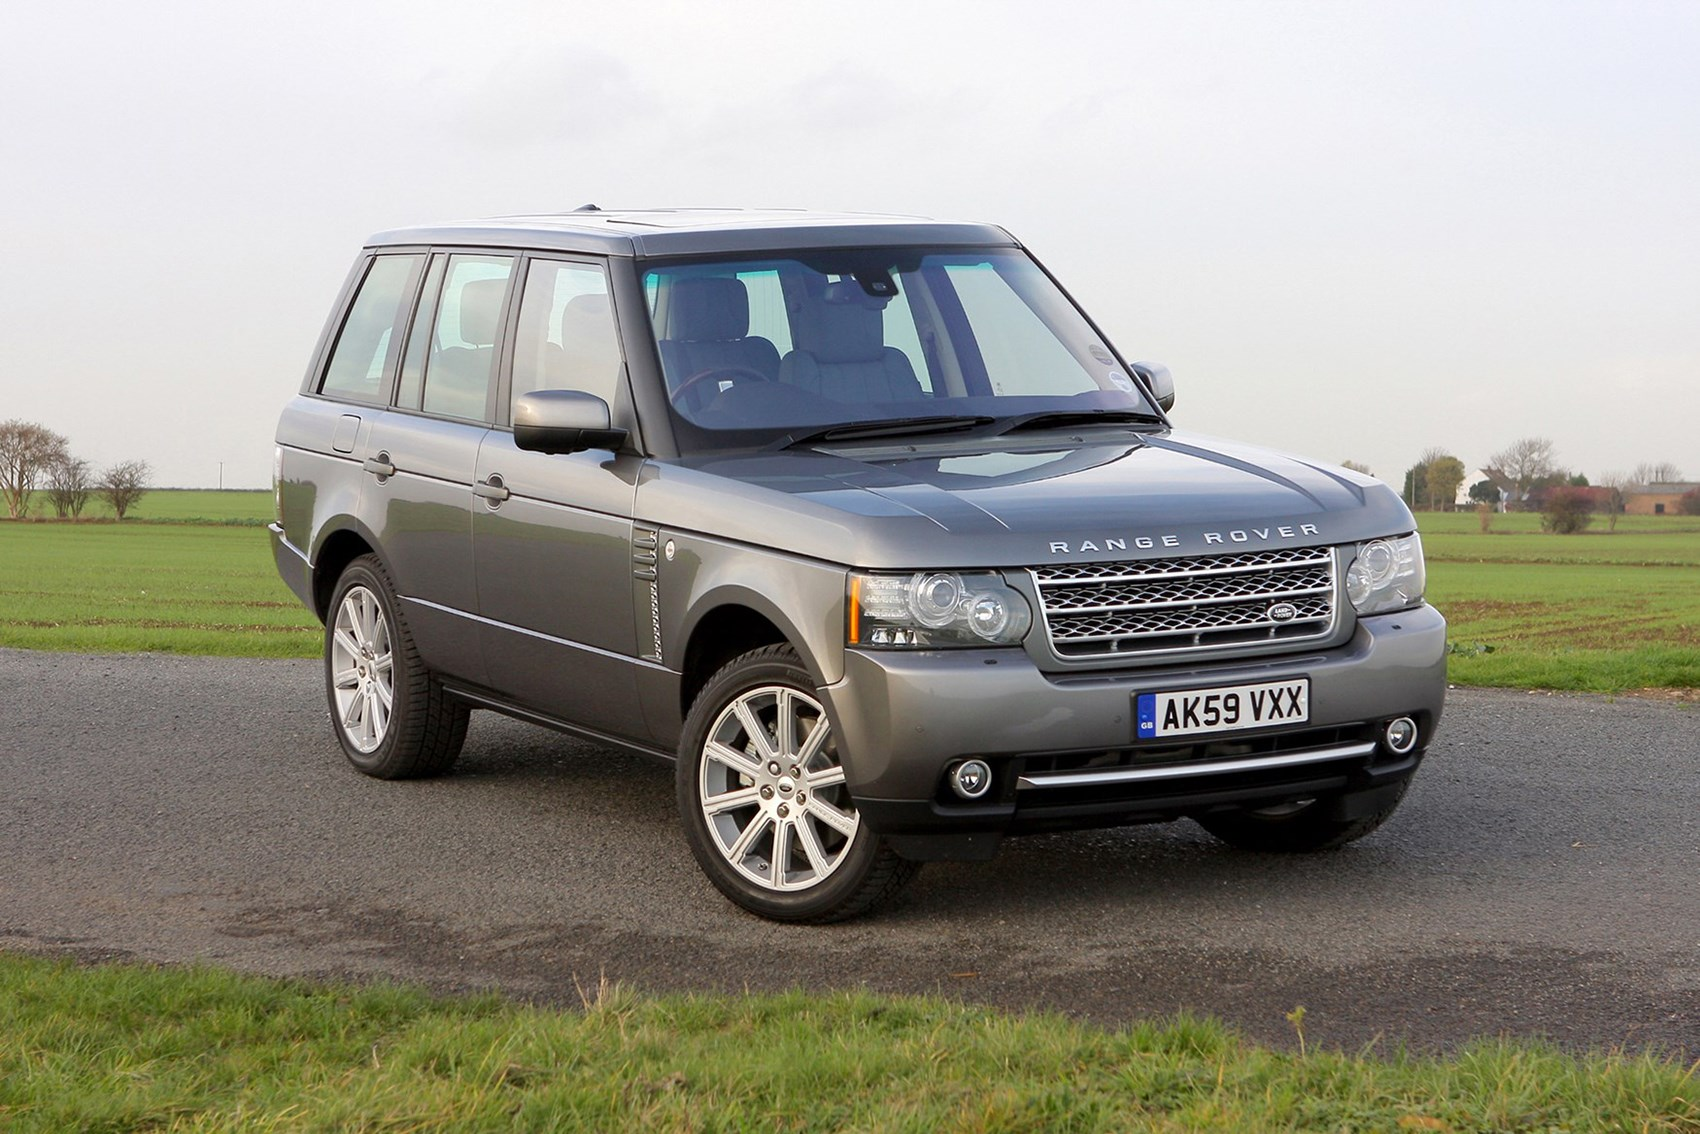 Range Rover - luxury cars for less than £10k